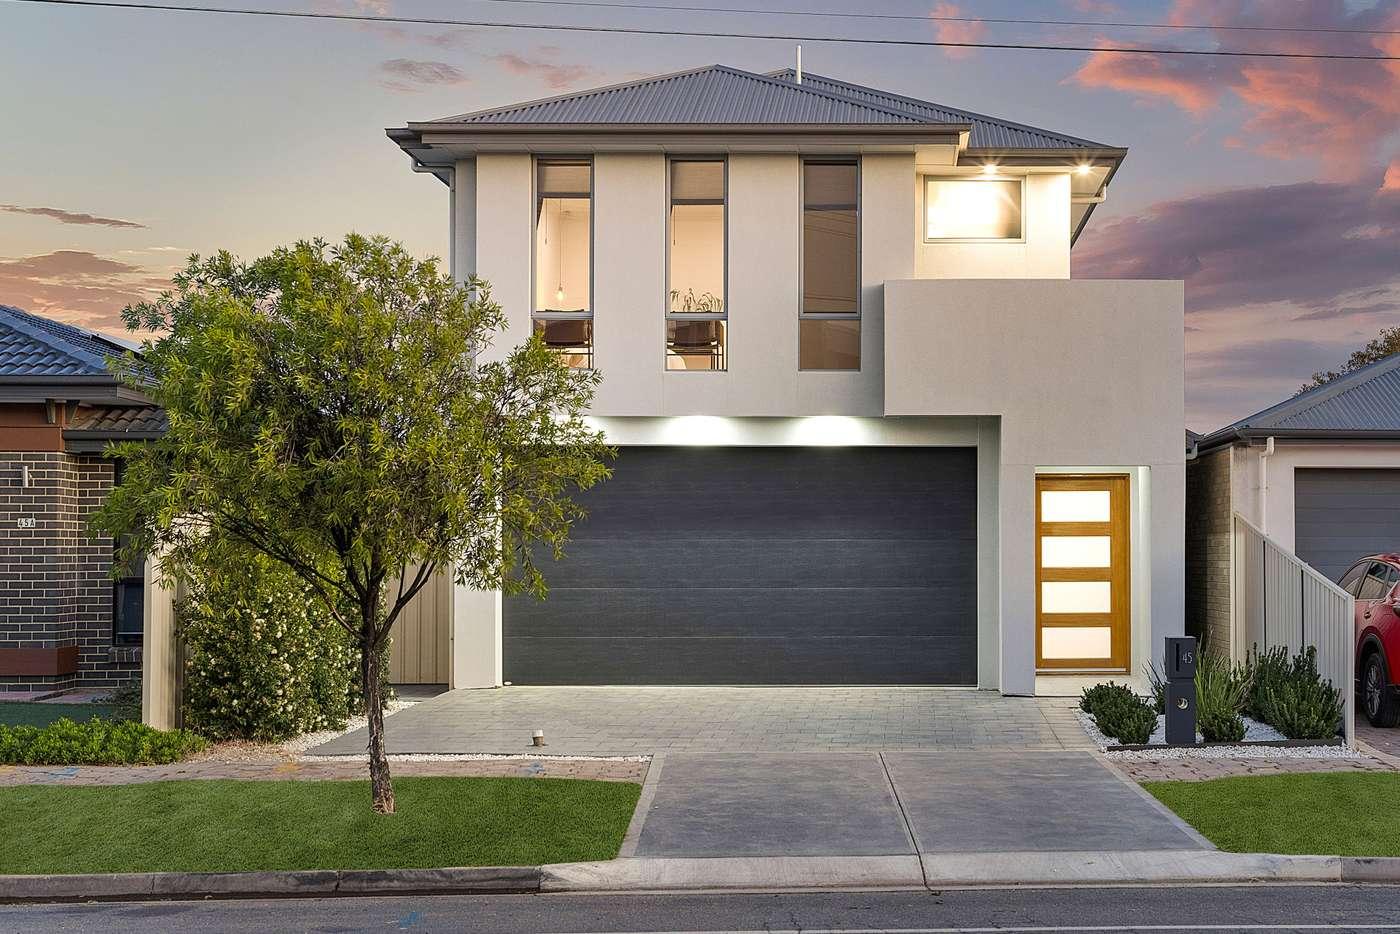 Main view of Homely house listing, 45 Redward Avenue, Greenacres SA 5086